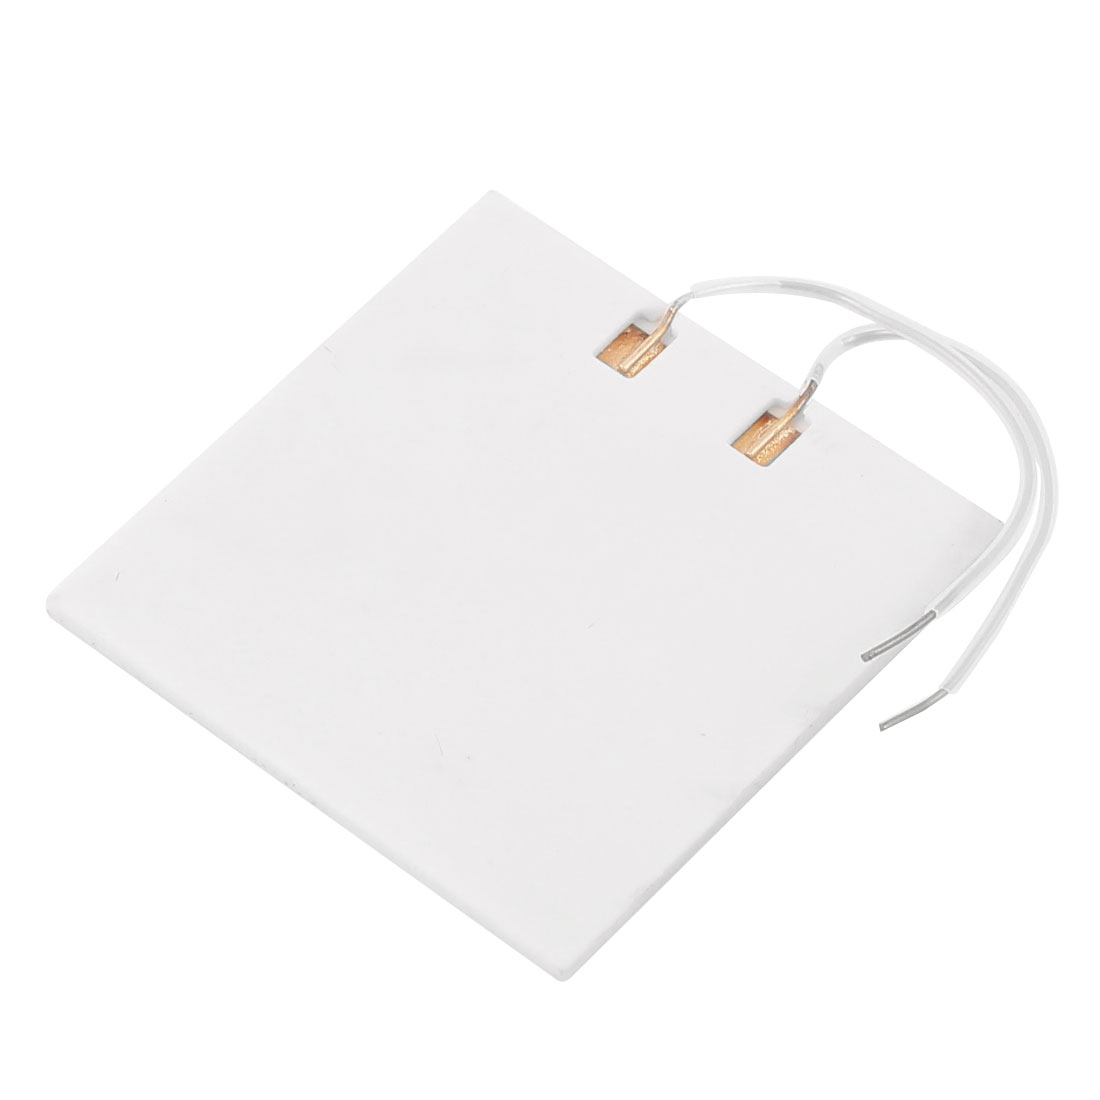 AC 12V 6W Mini Ceramic Heater Plate Heating Element White 40mm x 40mm